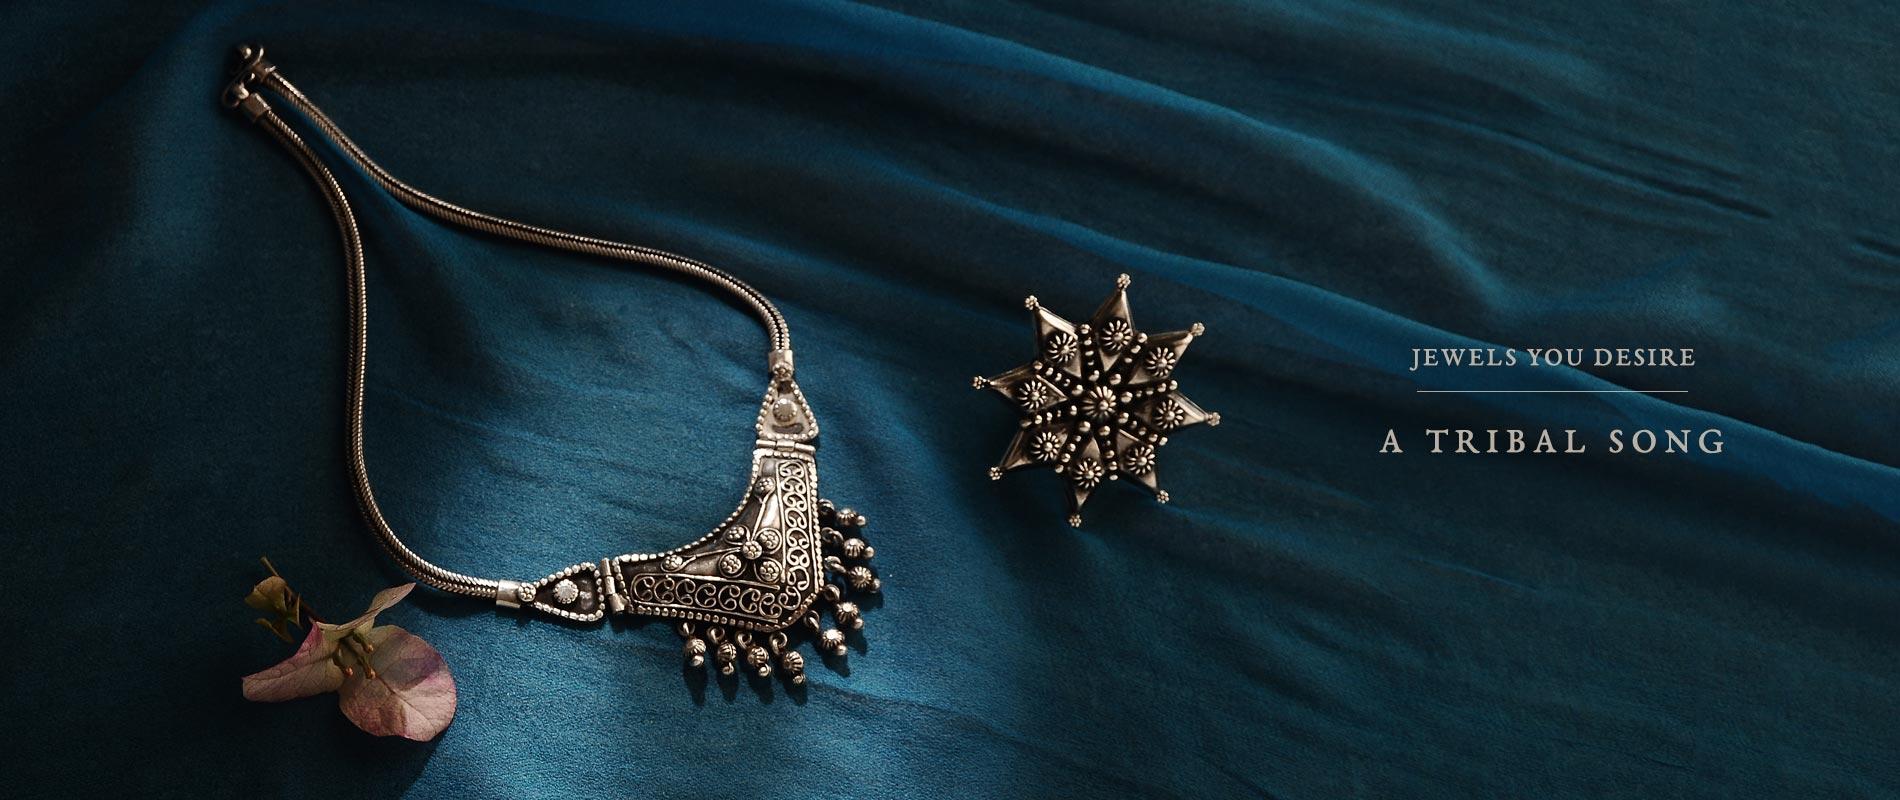 180203NHJ095_Naresh_Handicrafts_180214CUR205_Tribal_silver_8808